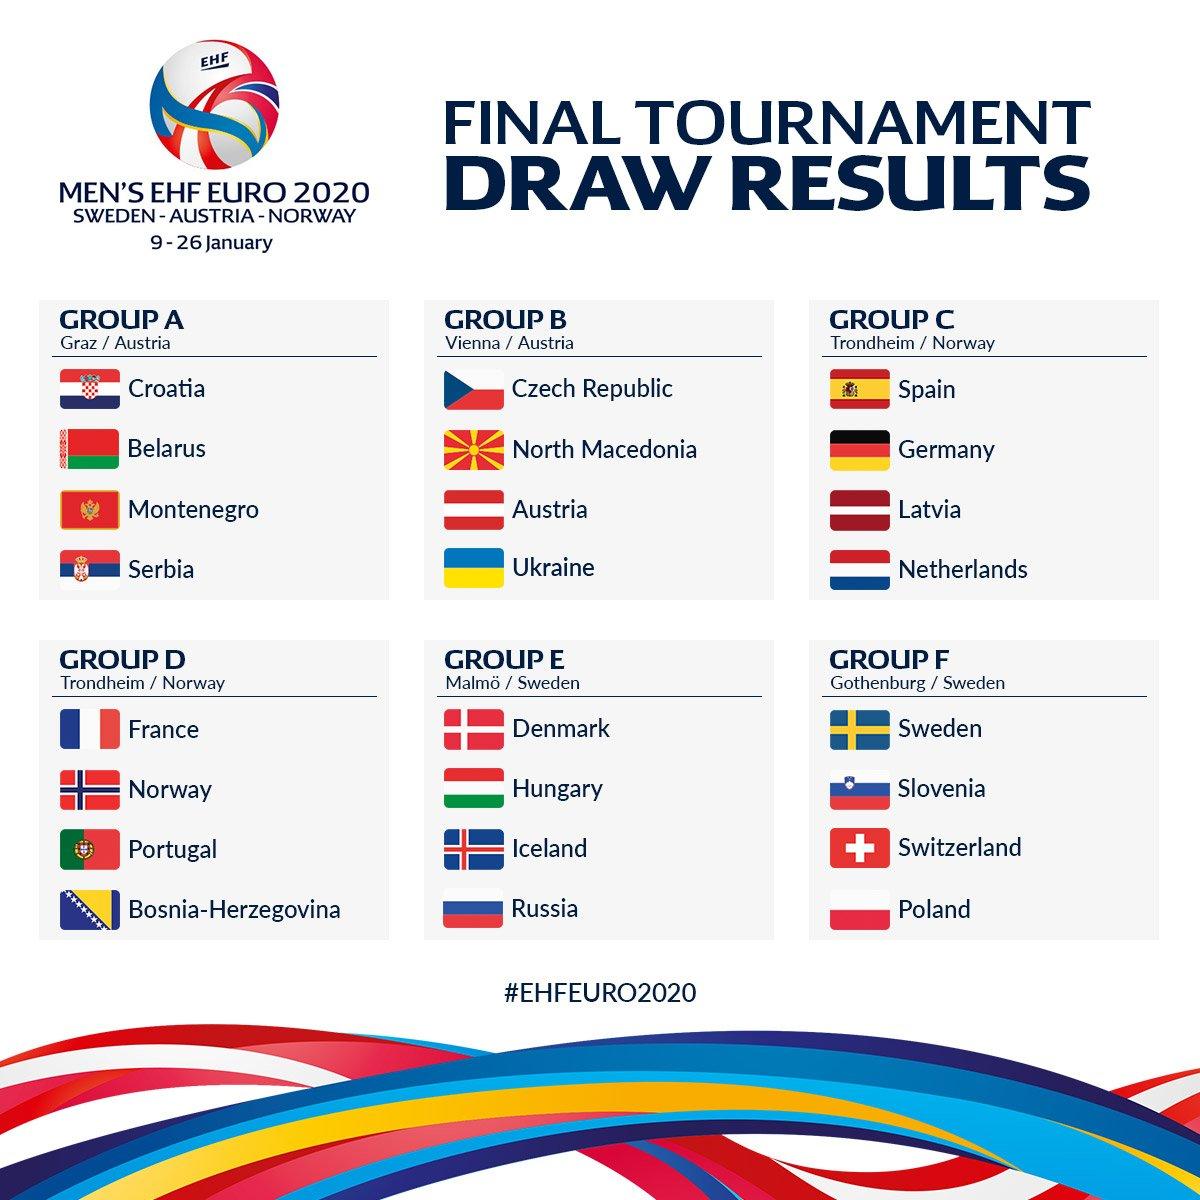 Ehf Euro On Twitter Men S Ehfeuro2020 Final Tournament